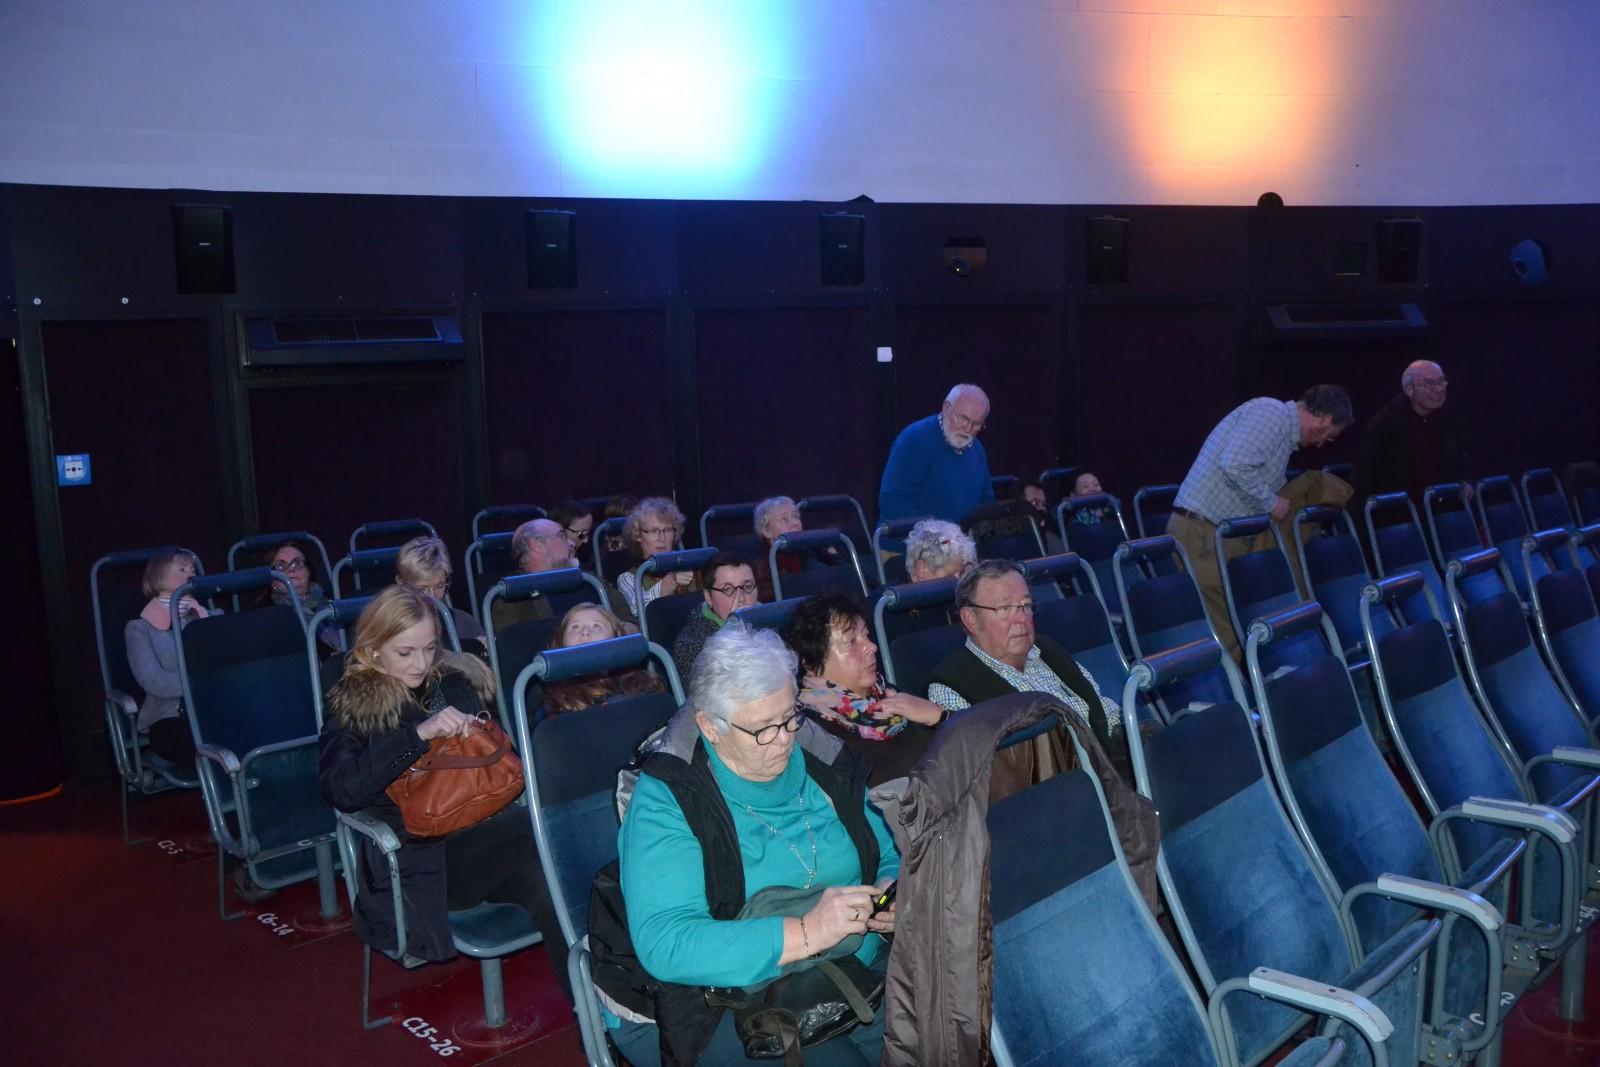 2015: Zeiss-Planetarium Jena